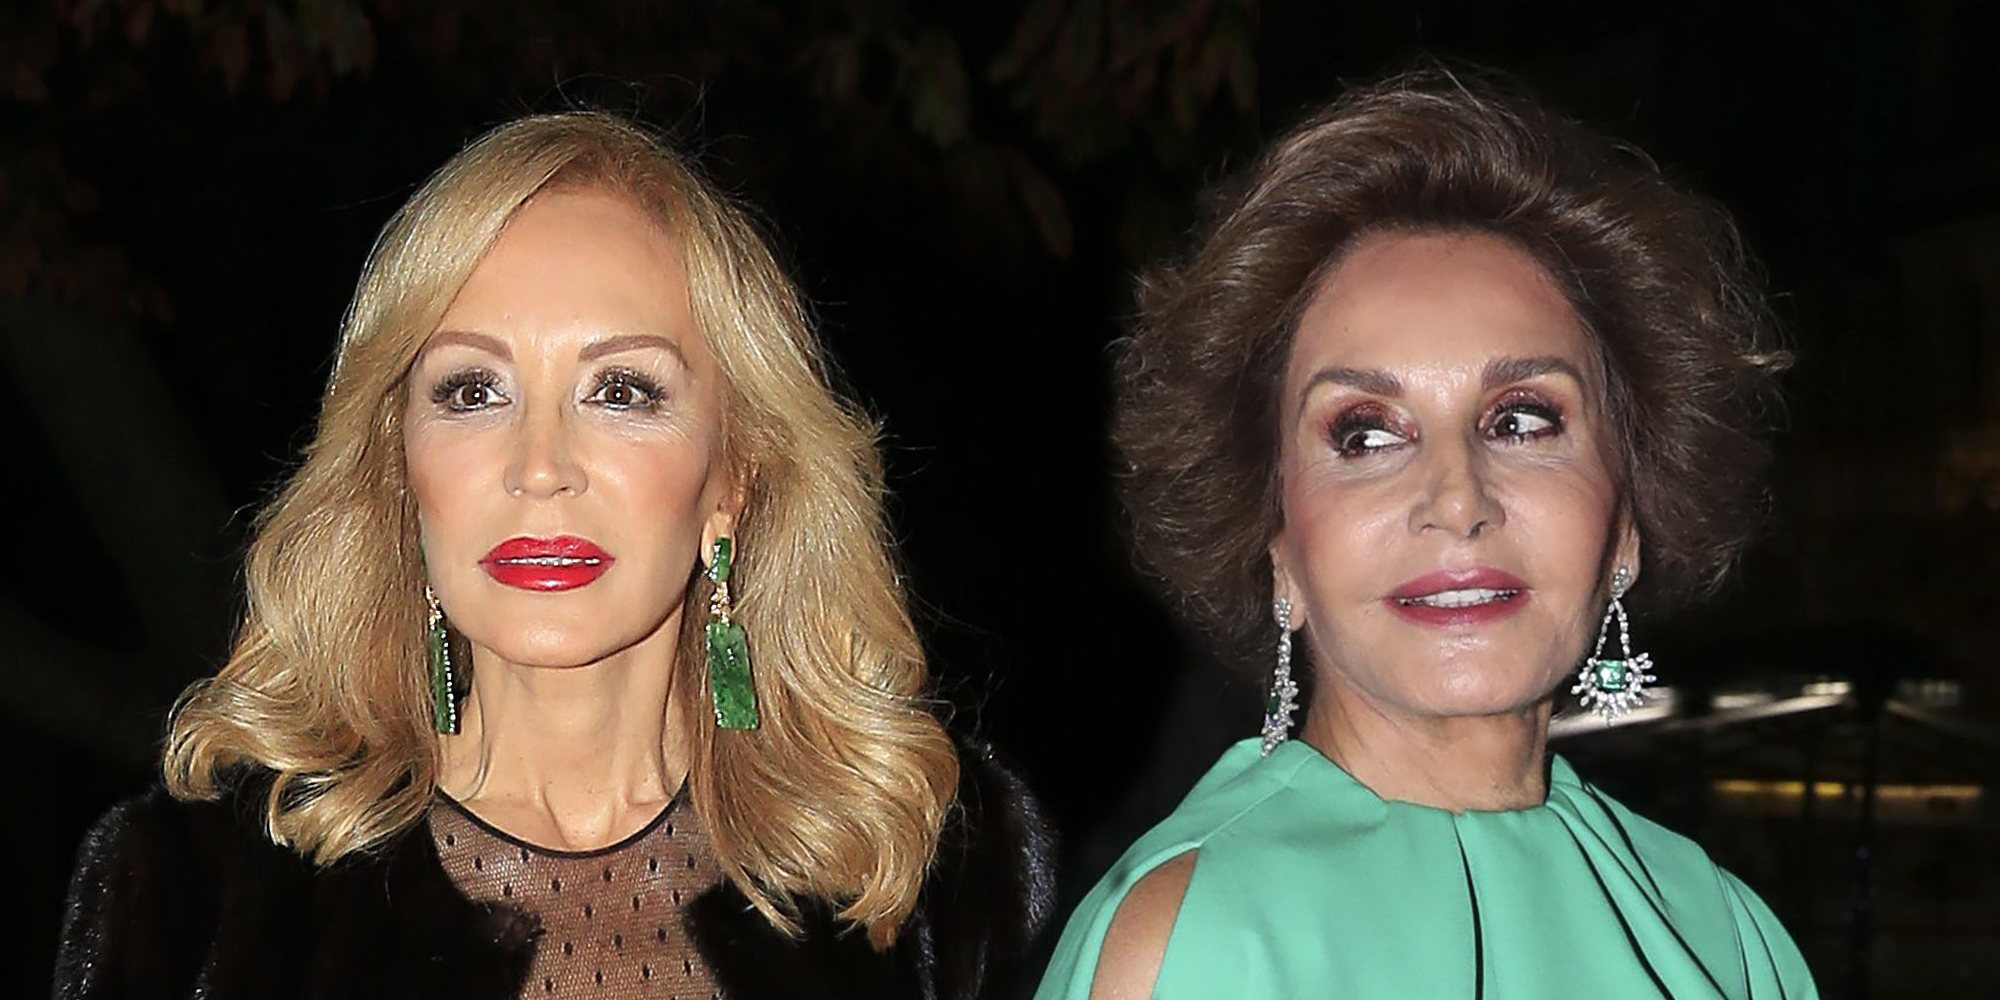 La enemistad de Carmen Lomana y Naty Abascal: dos divas enfrentadas por el trono de la moda